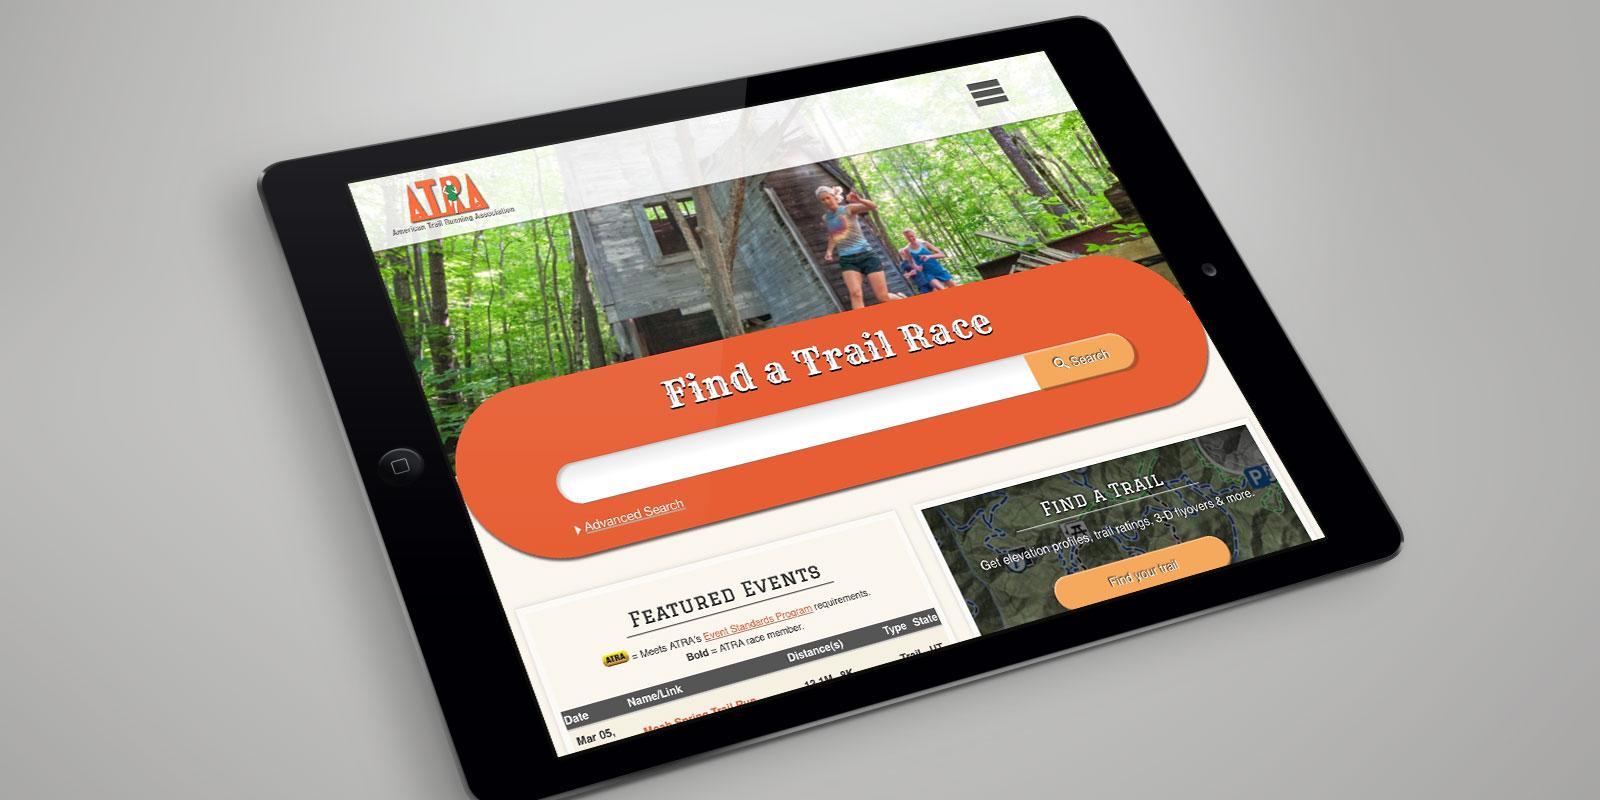 American Trail Running Association website on a tablet